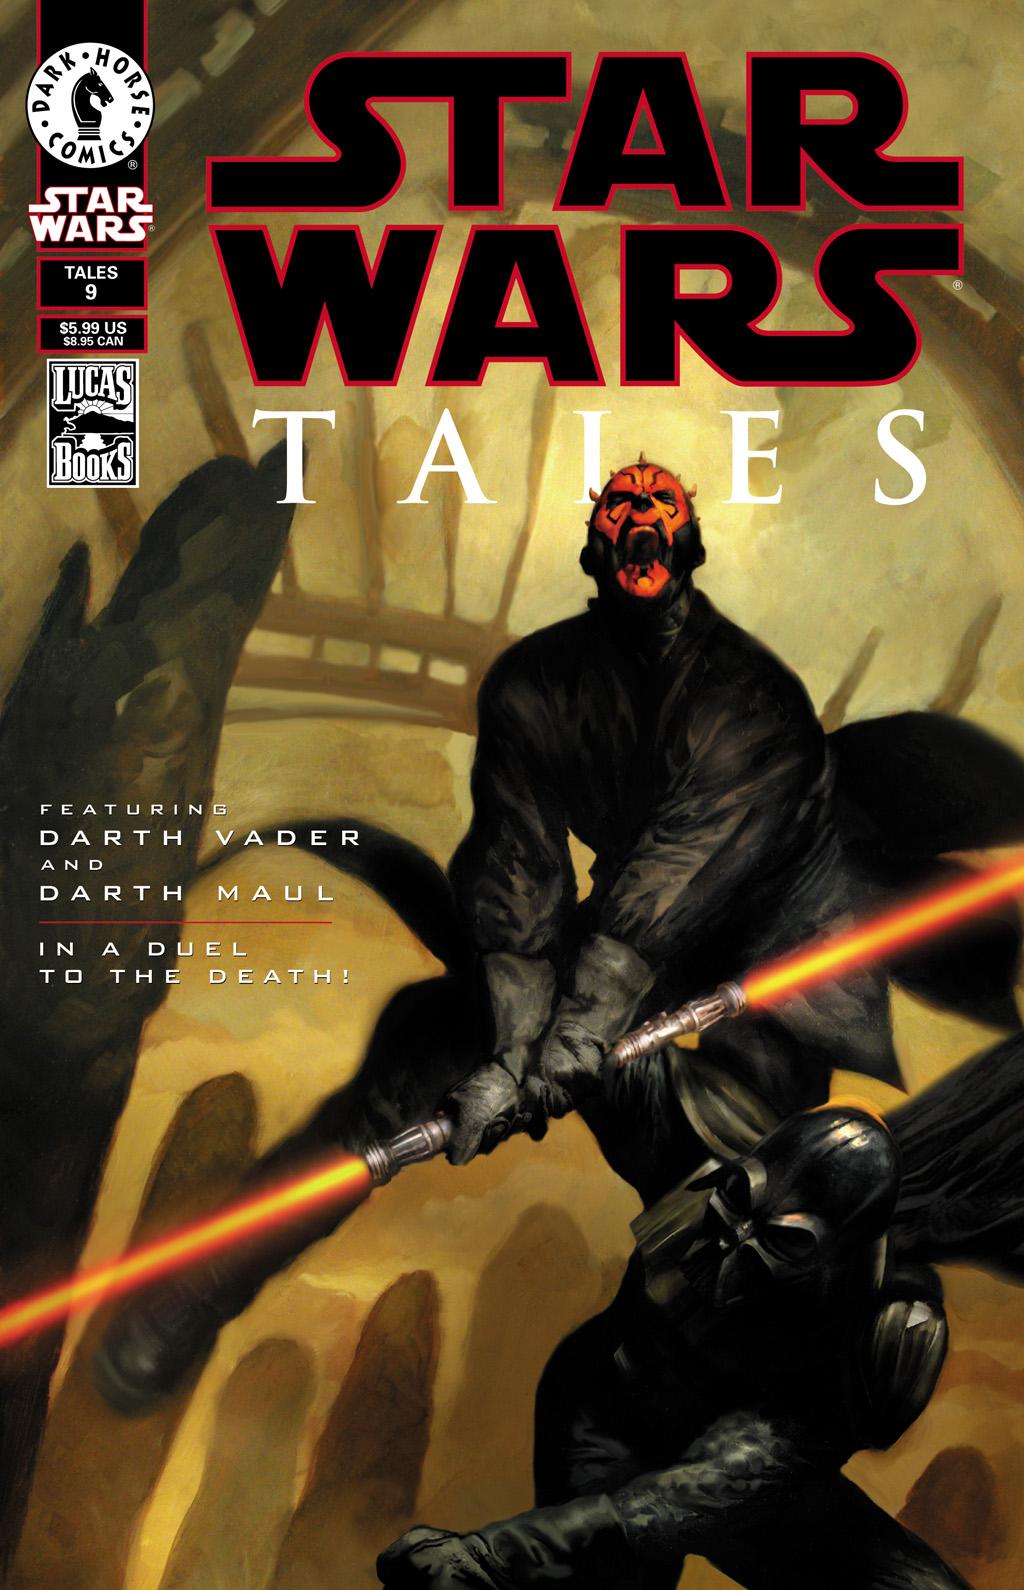 Star Wars Tales 9 | Wookieepedia | Fandom powered by Wikia